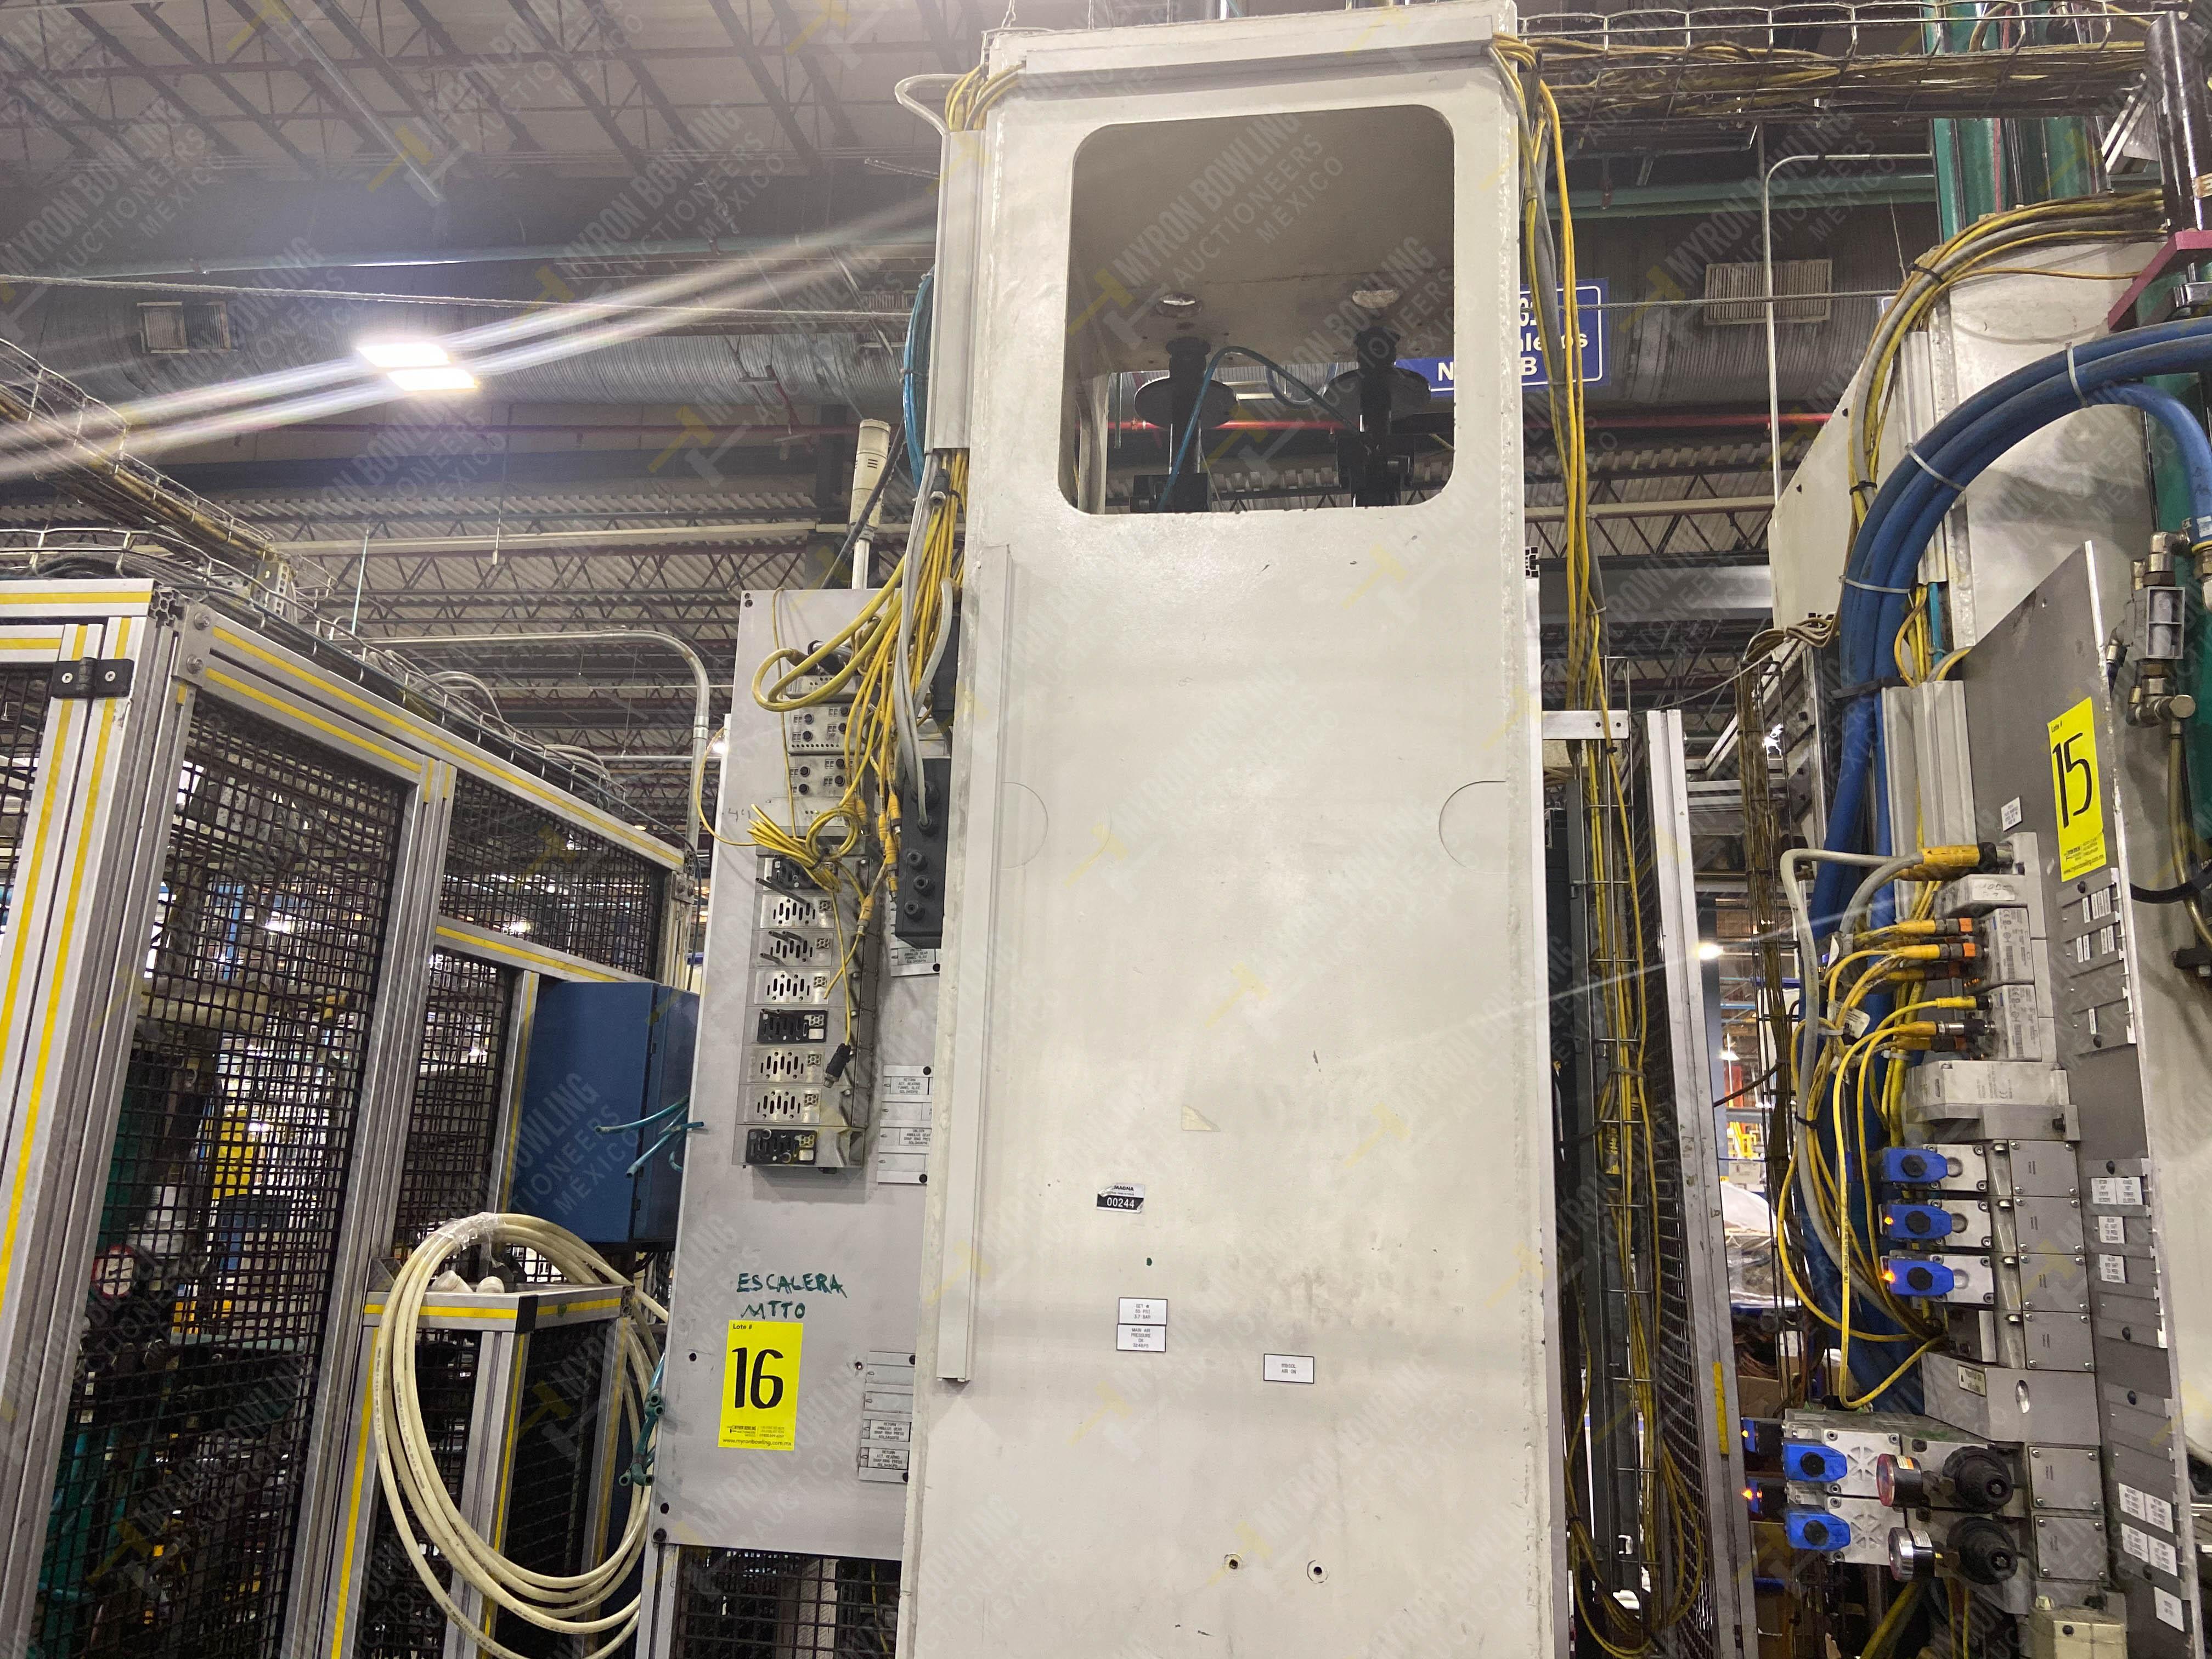 Estación semiautomática para operación 305D, contiene: Prensa tipo cuello de ganso con dos cilindros - Image 9 of 20